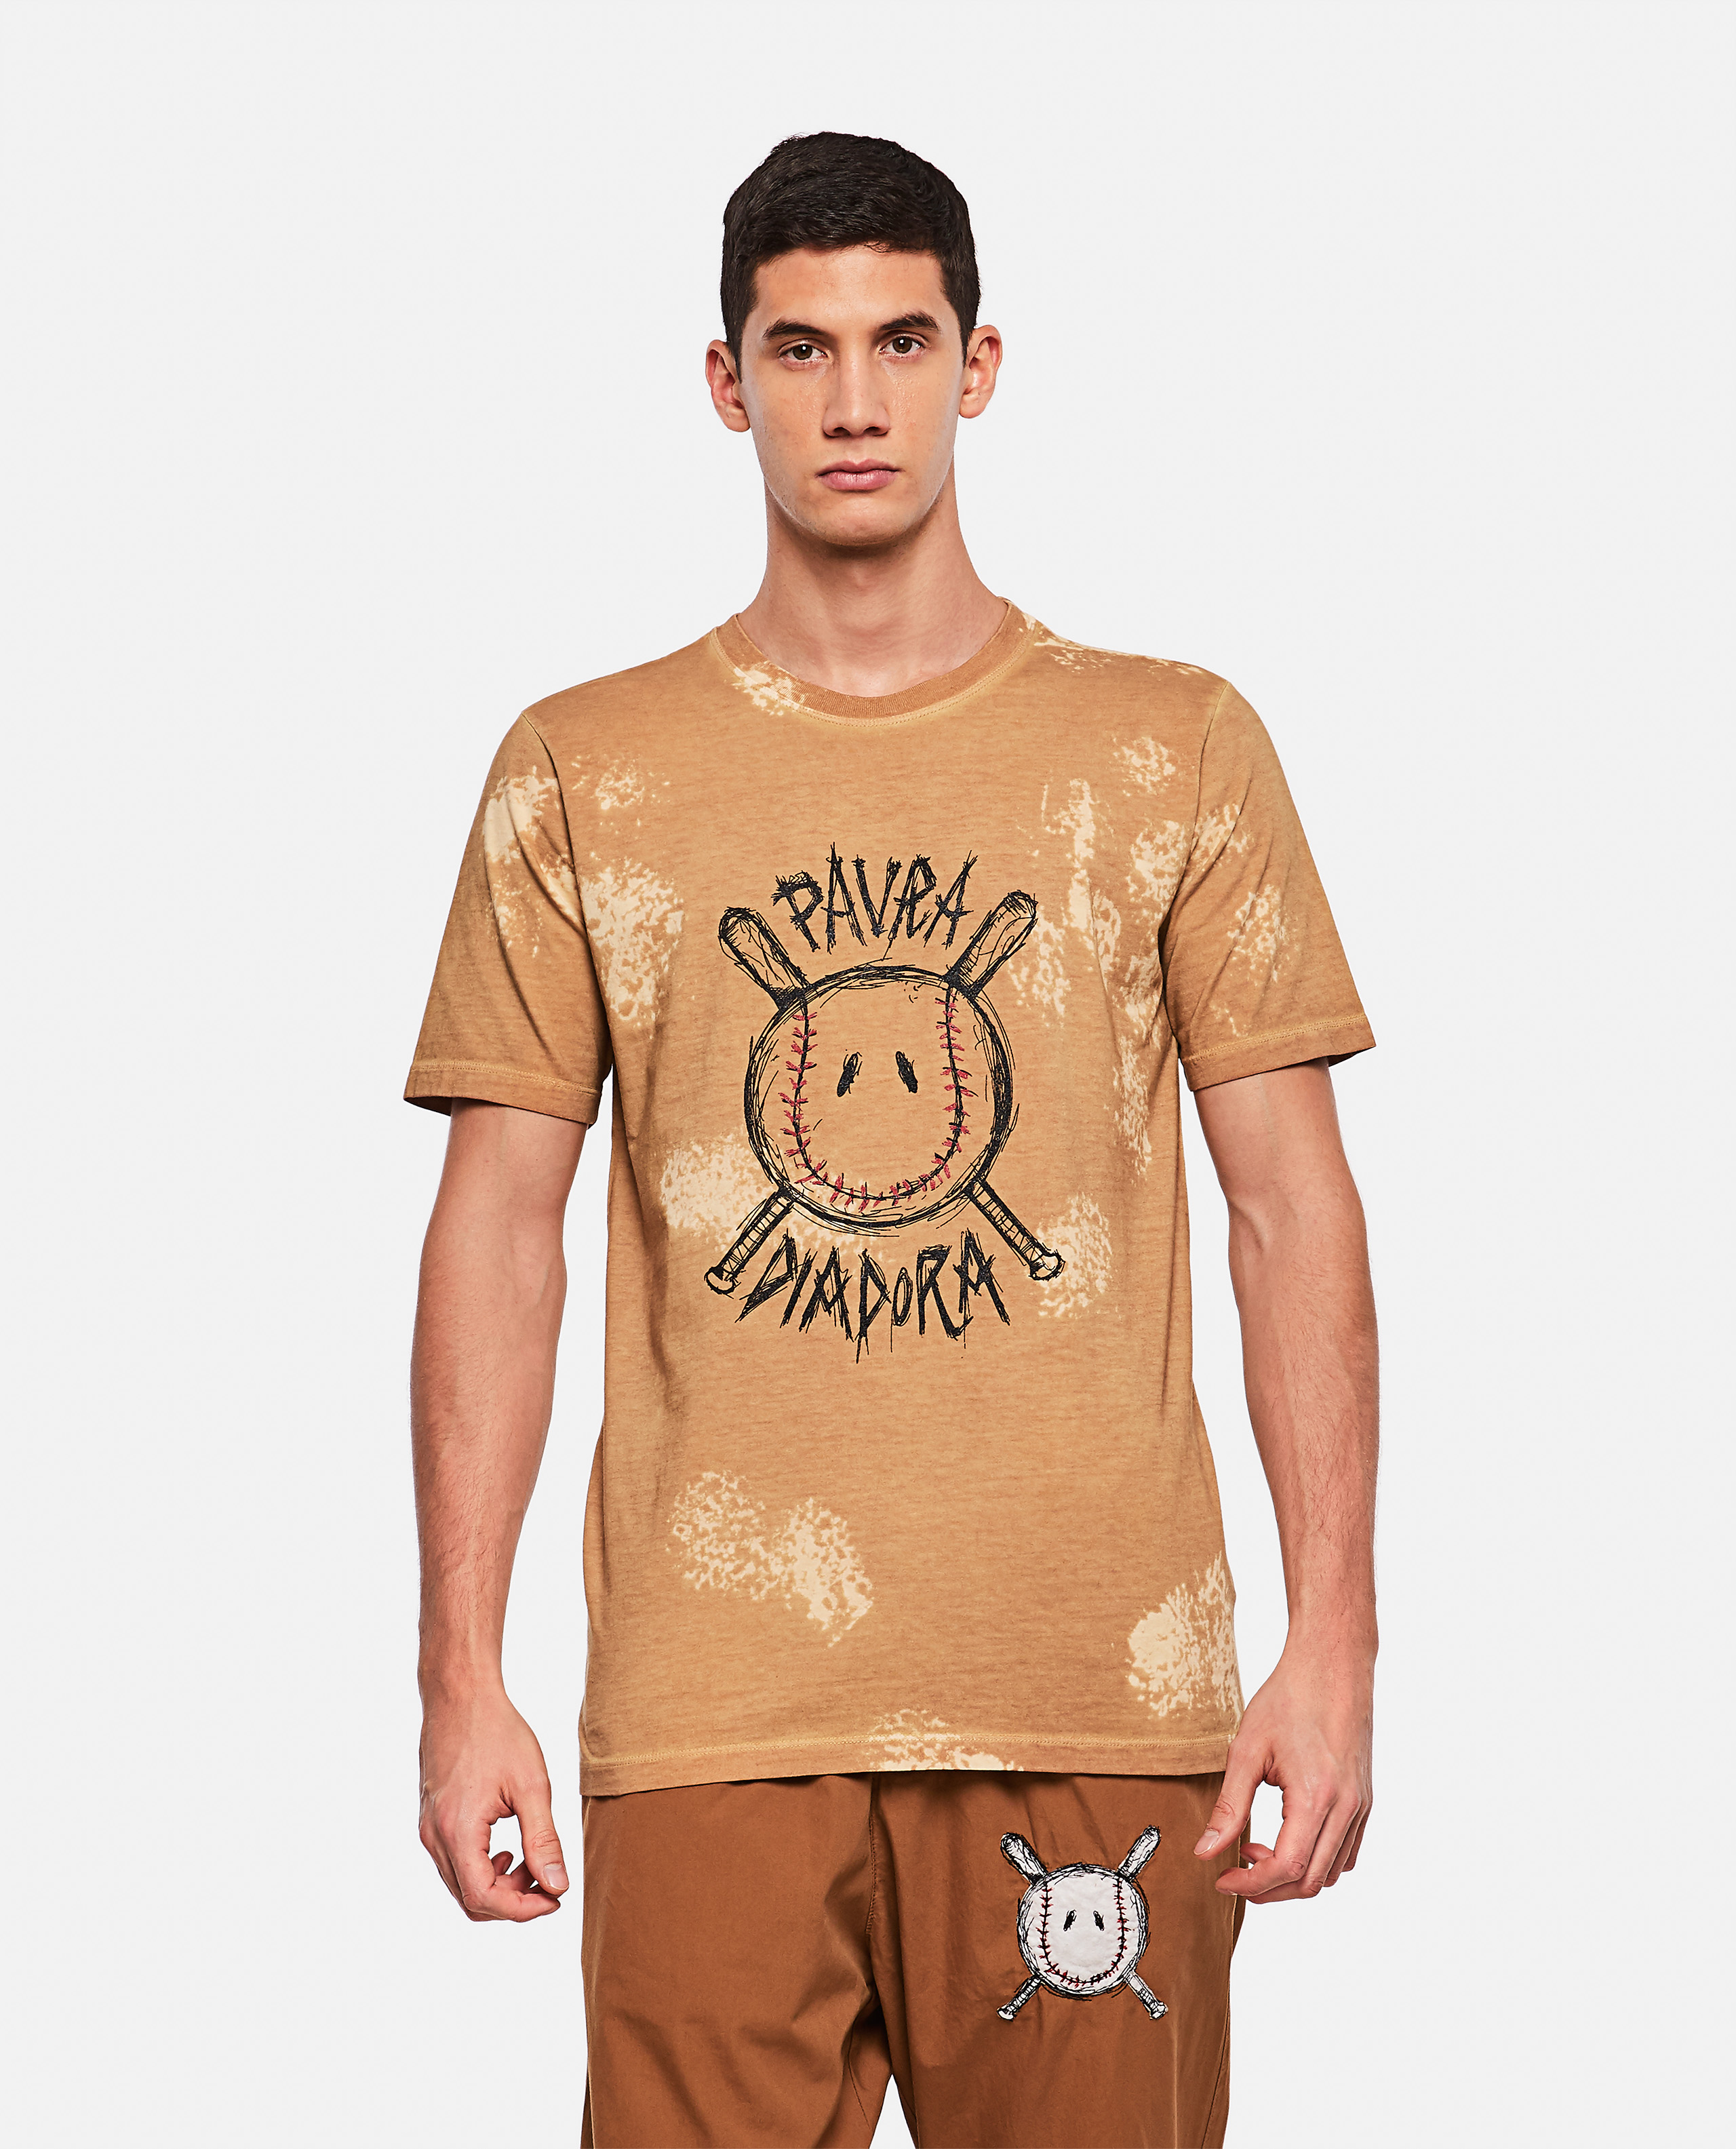 Paura x Diadora t-shirt